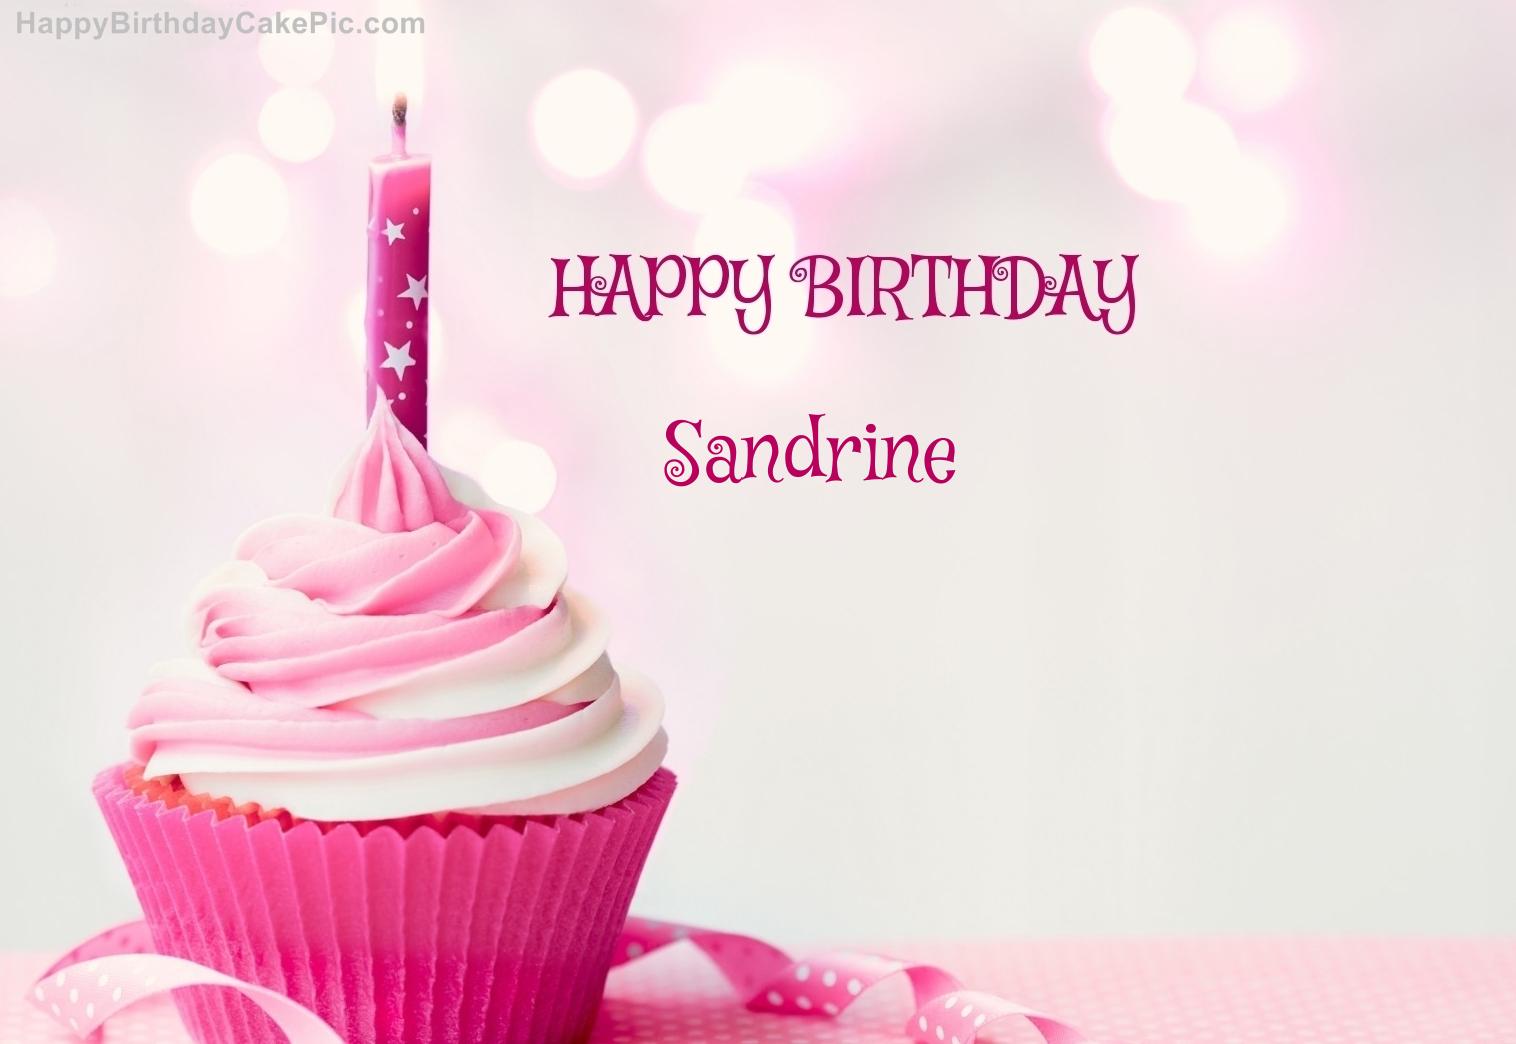 Happy Birthday Cupcake Candle Pink Cake For Sandrine